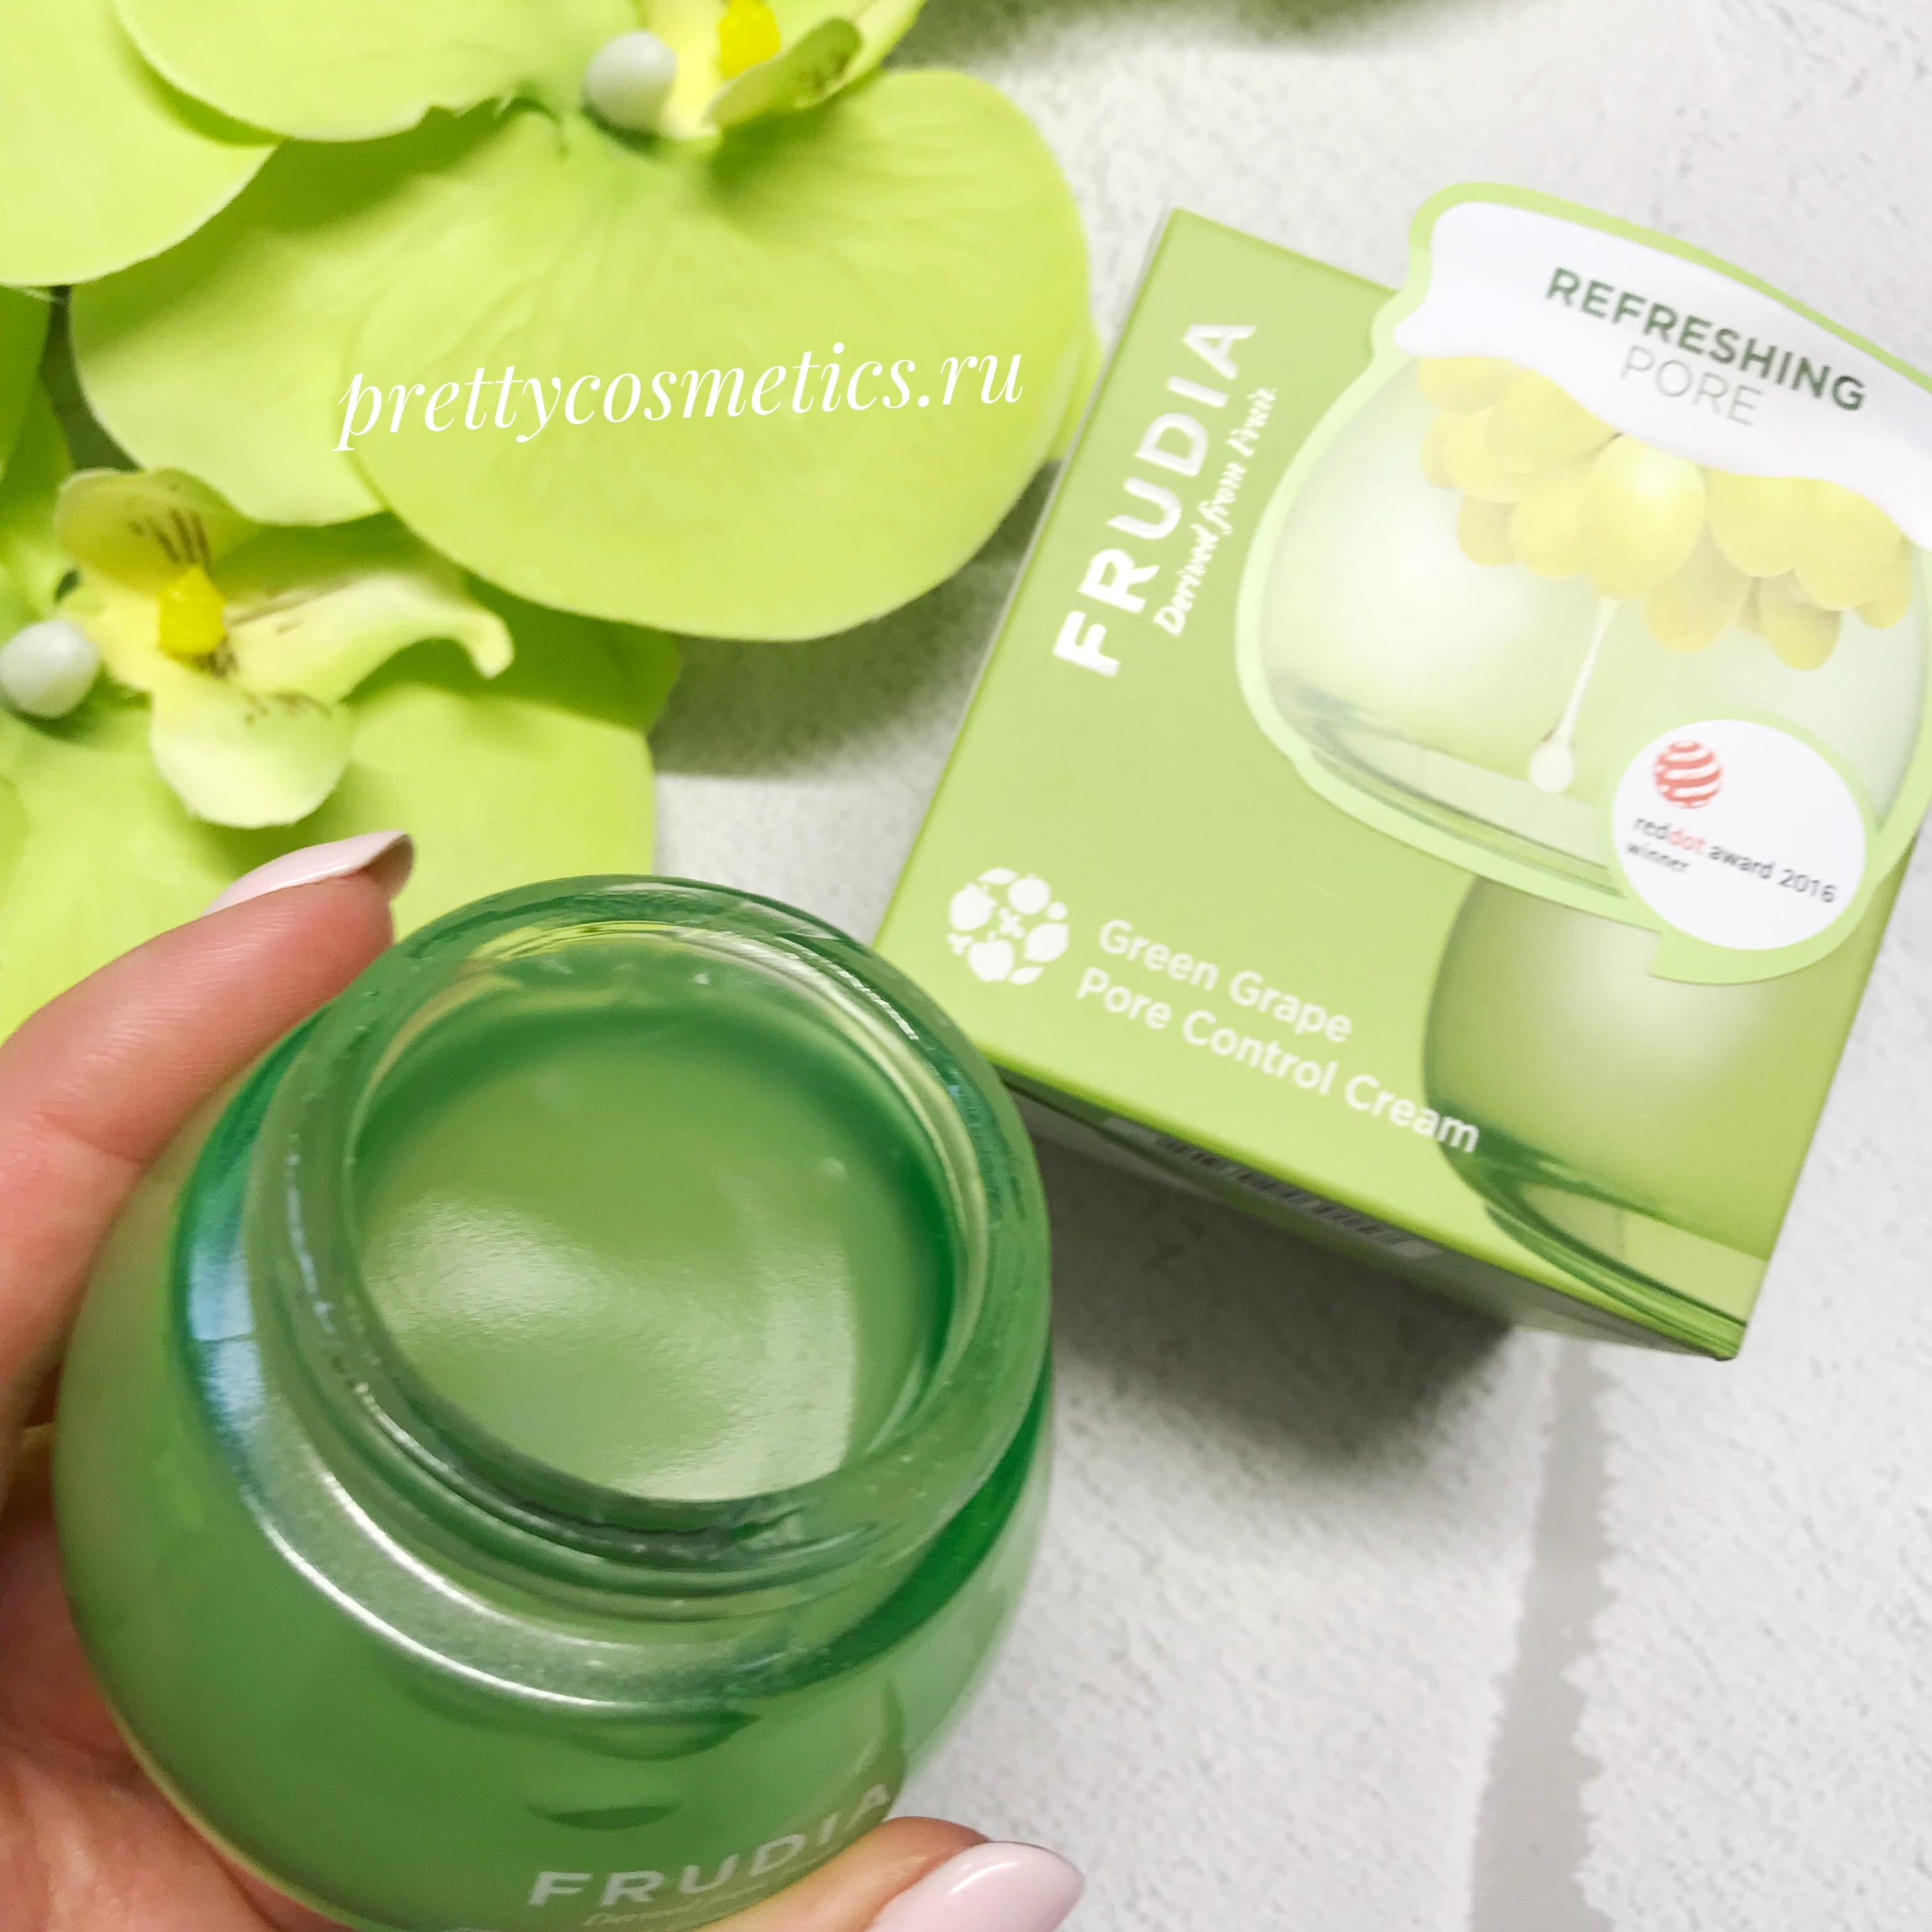 Frudia Green Grape Pore Control Cream Фрудиа Себорегулирующий крем с зеленым виноградом 55гр